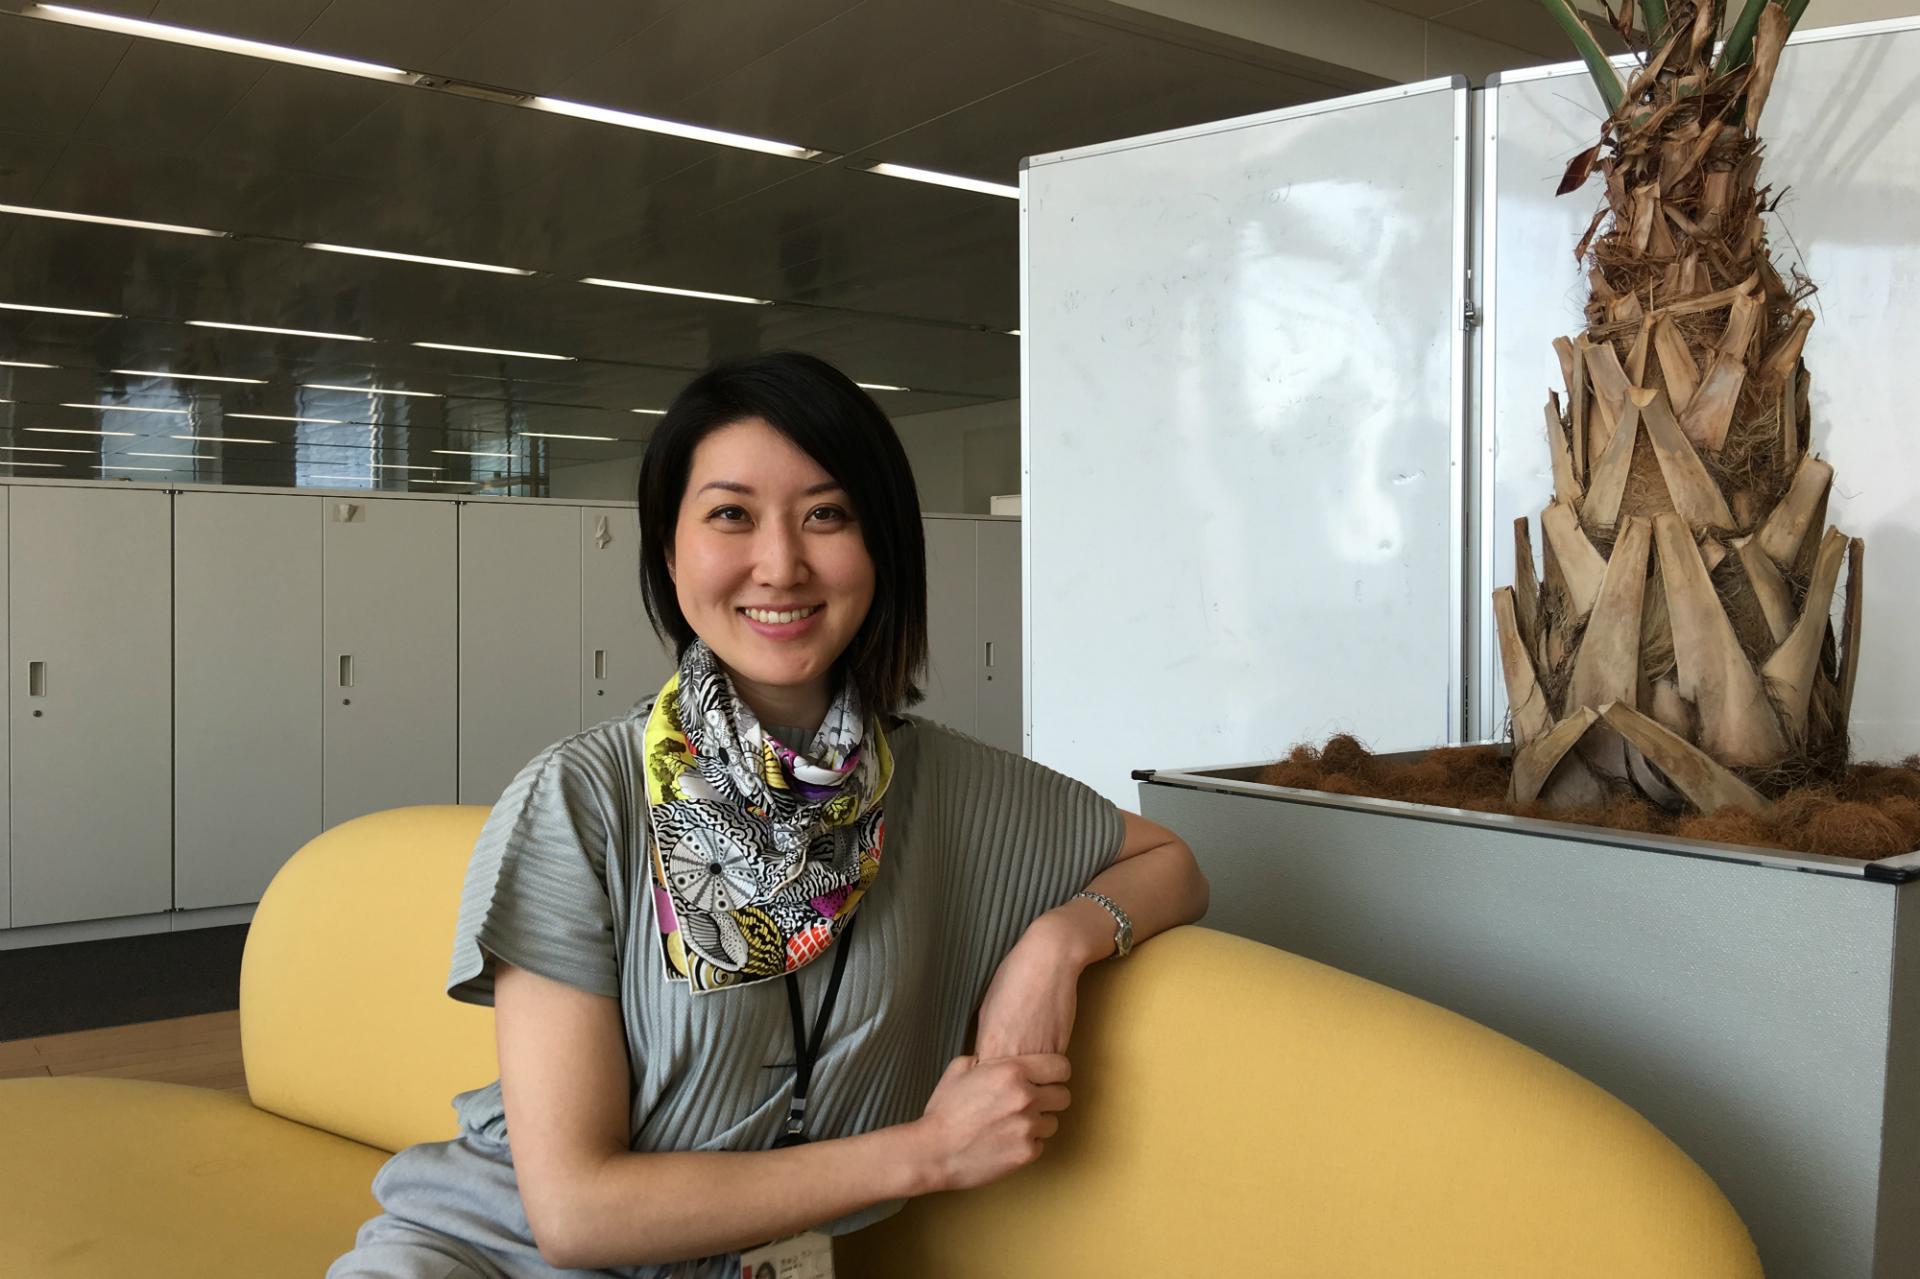 她,翻轉日本百年品牌的公司文化 - 資生堂總部 Global Compliance, Risk Management Group Leader 婉芳